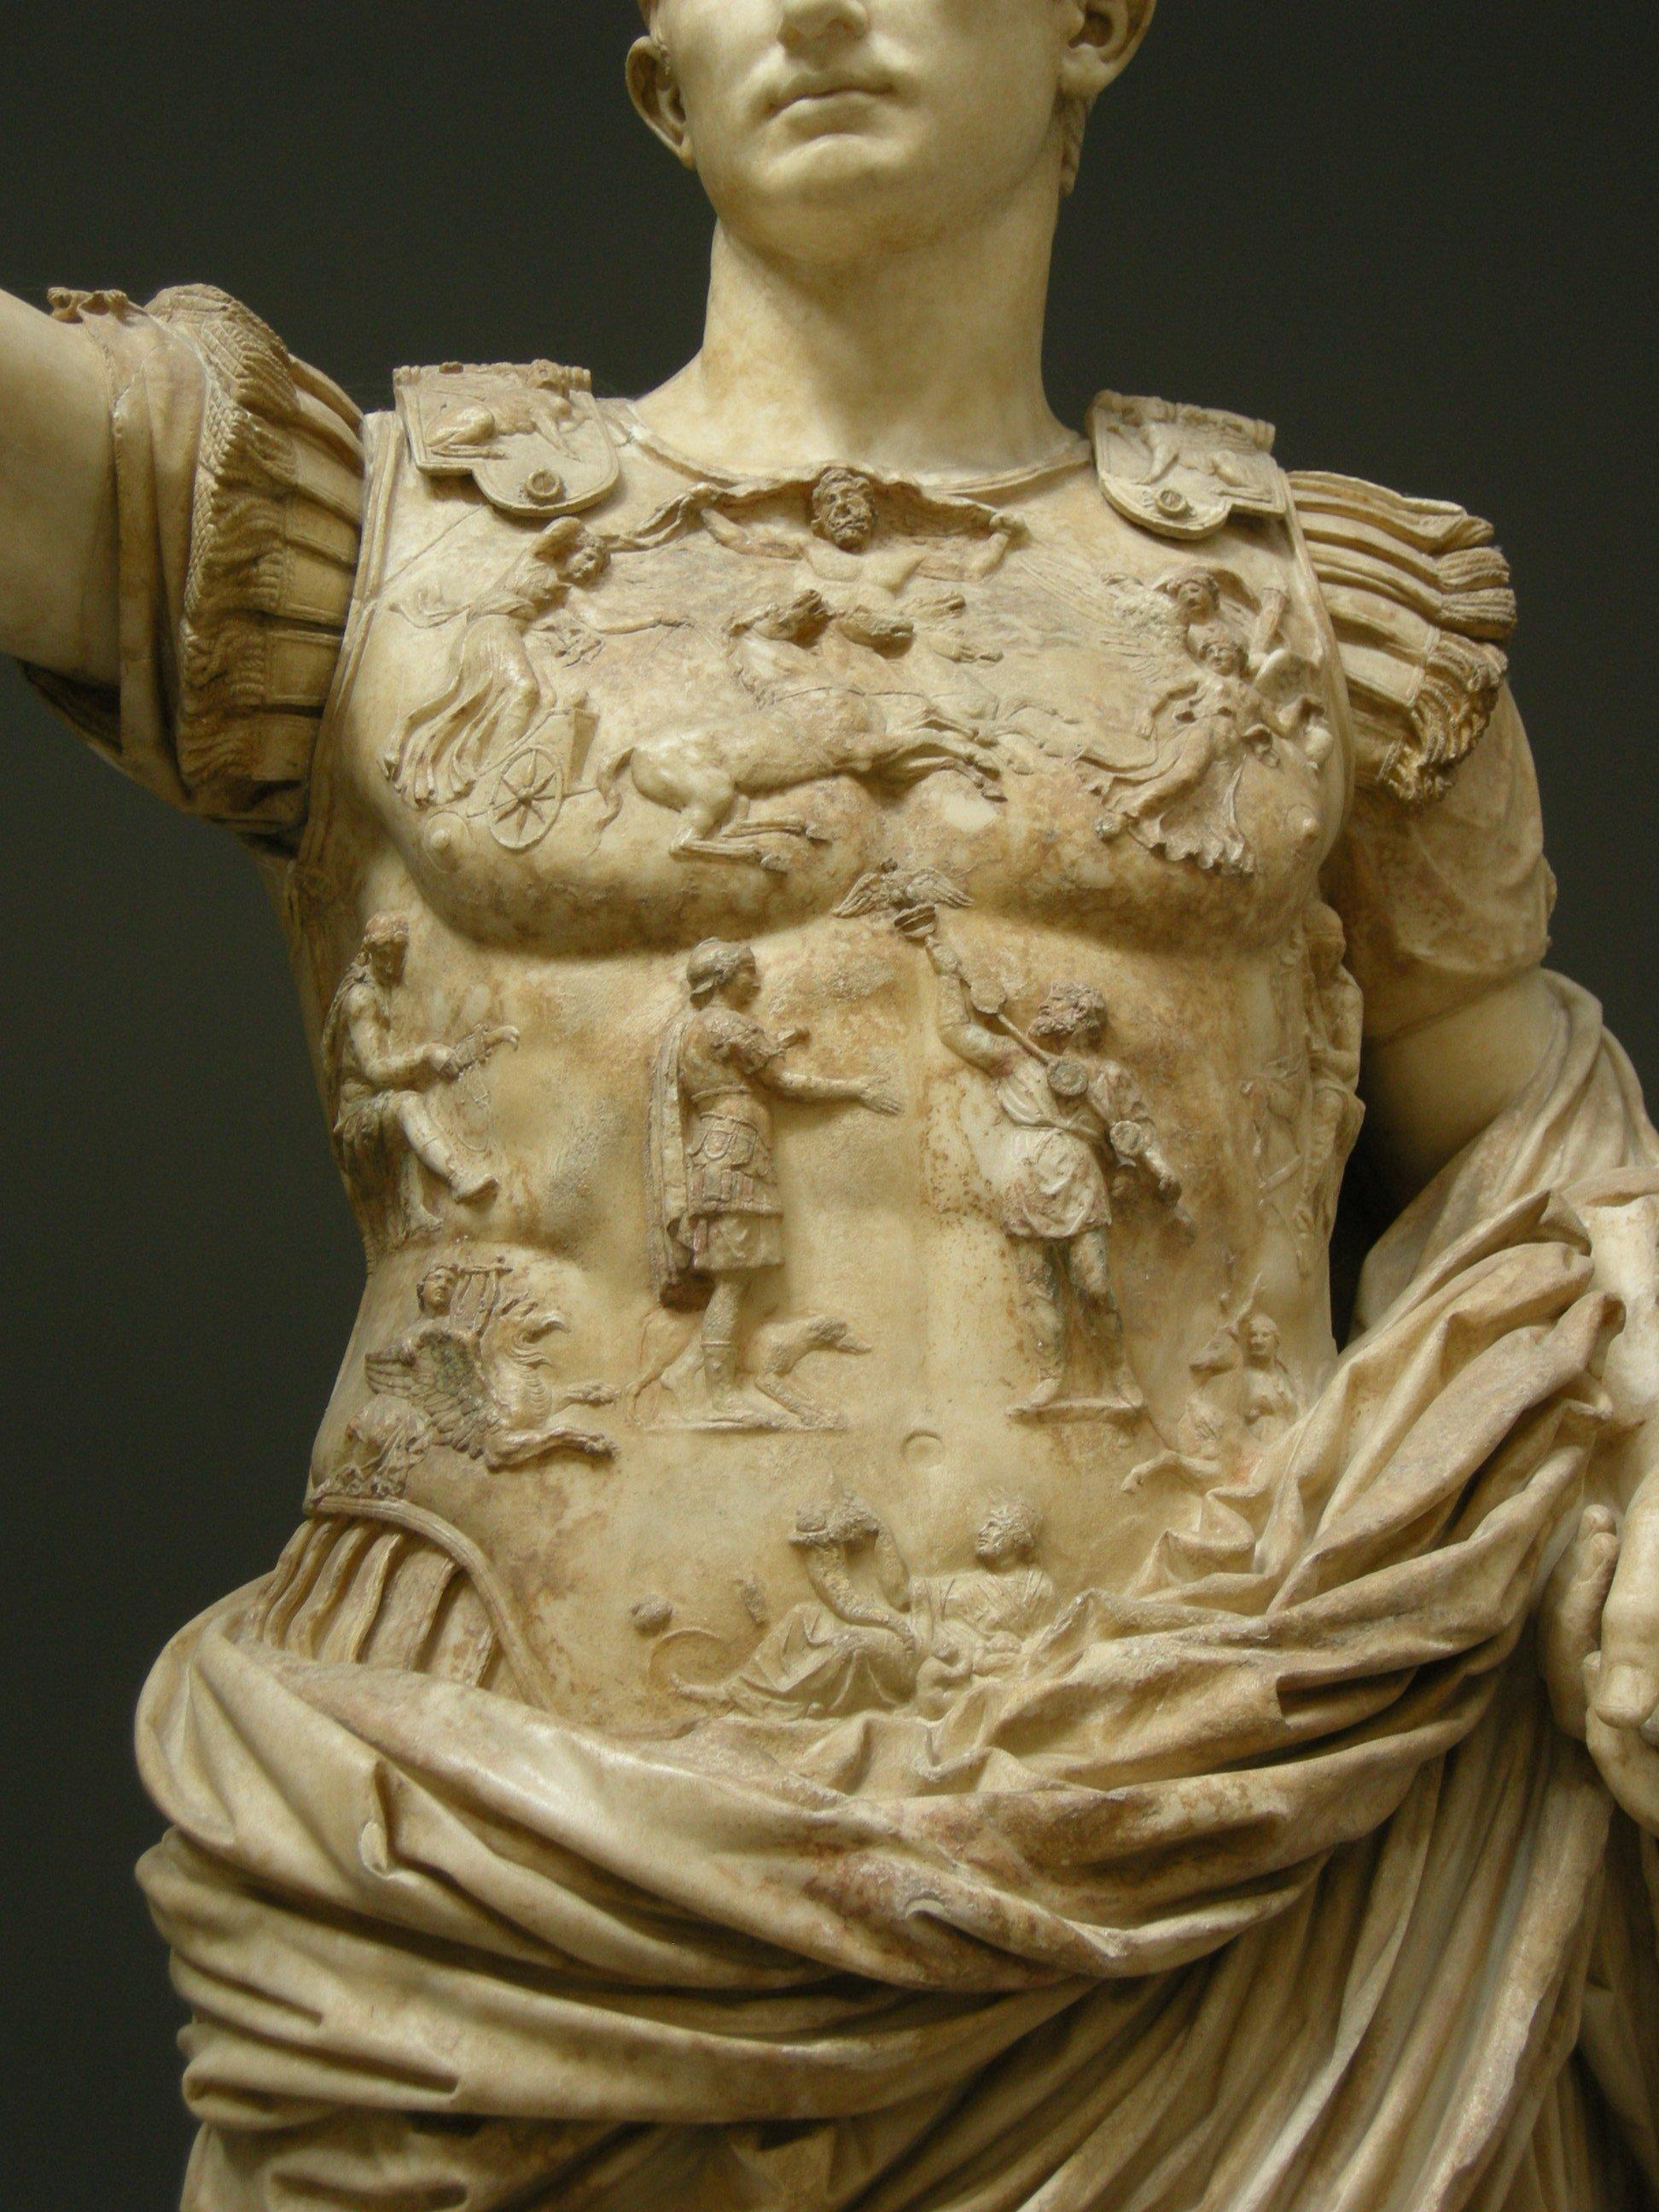 Slavic God Veles Marble Sculpture Figurine Patron of Wealth Fertility Prosperity